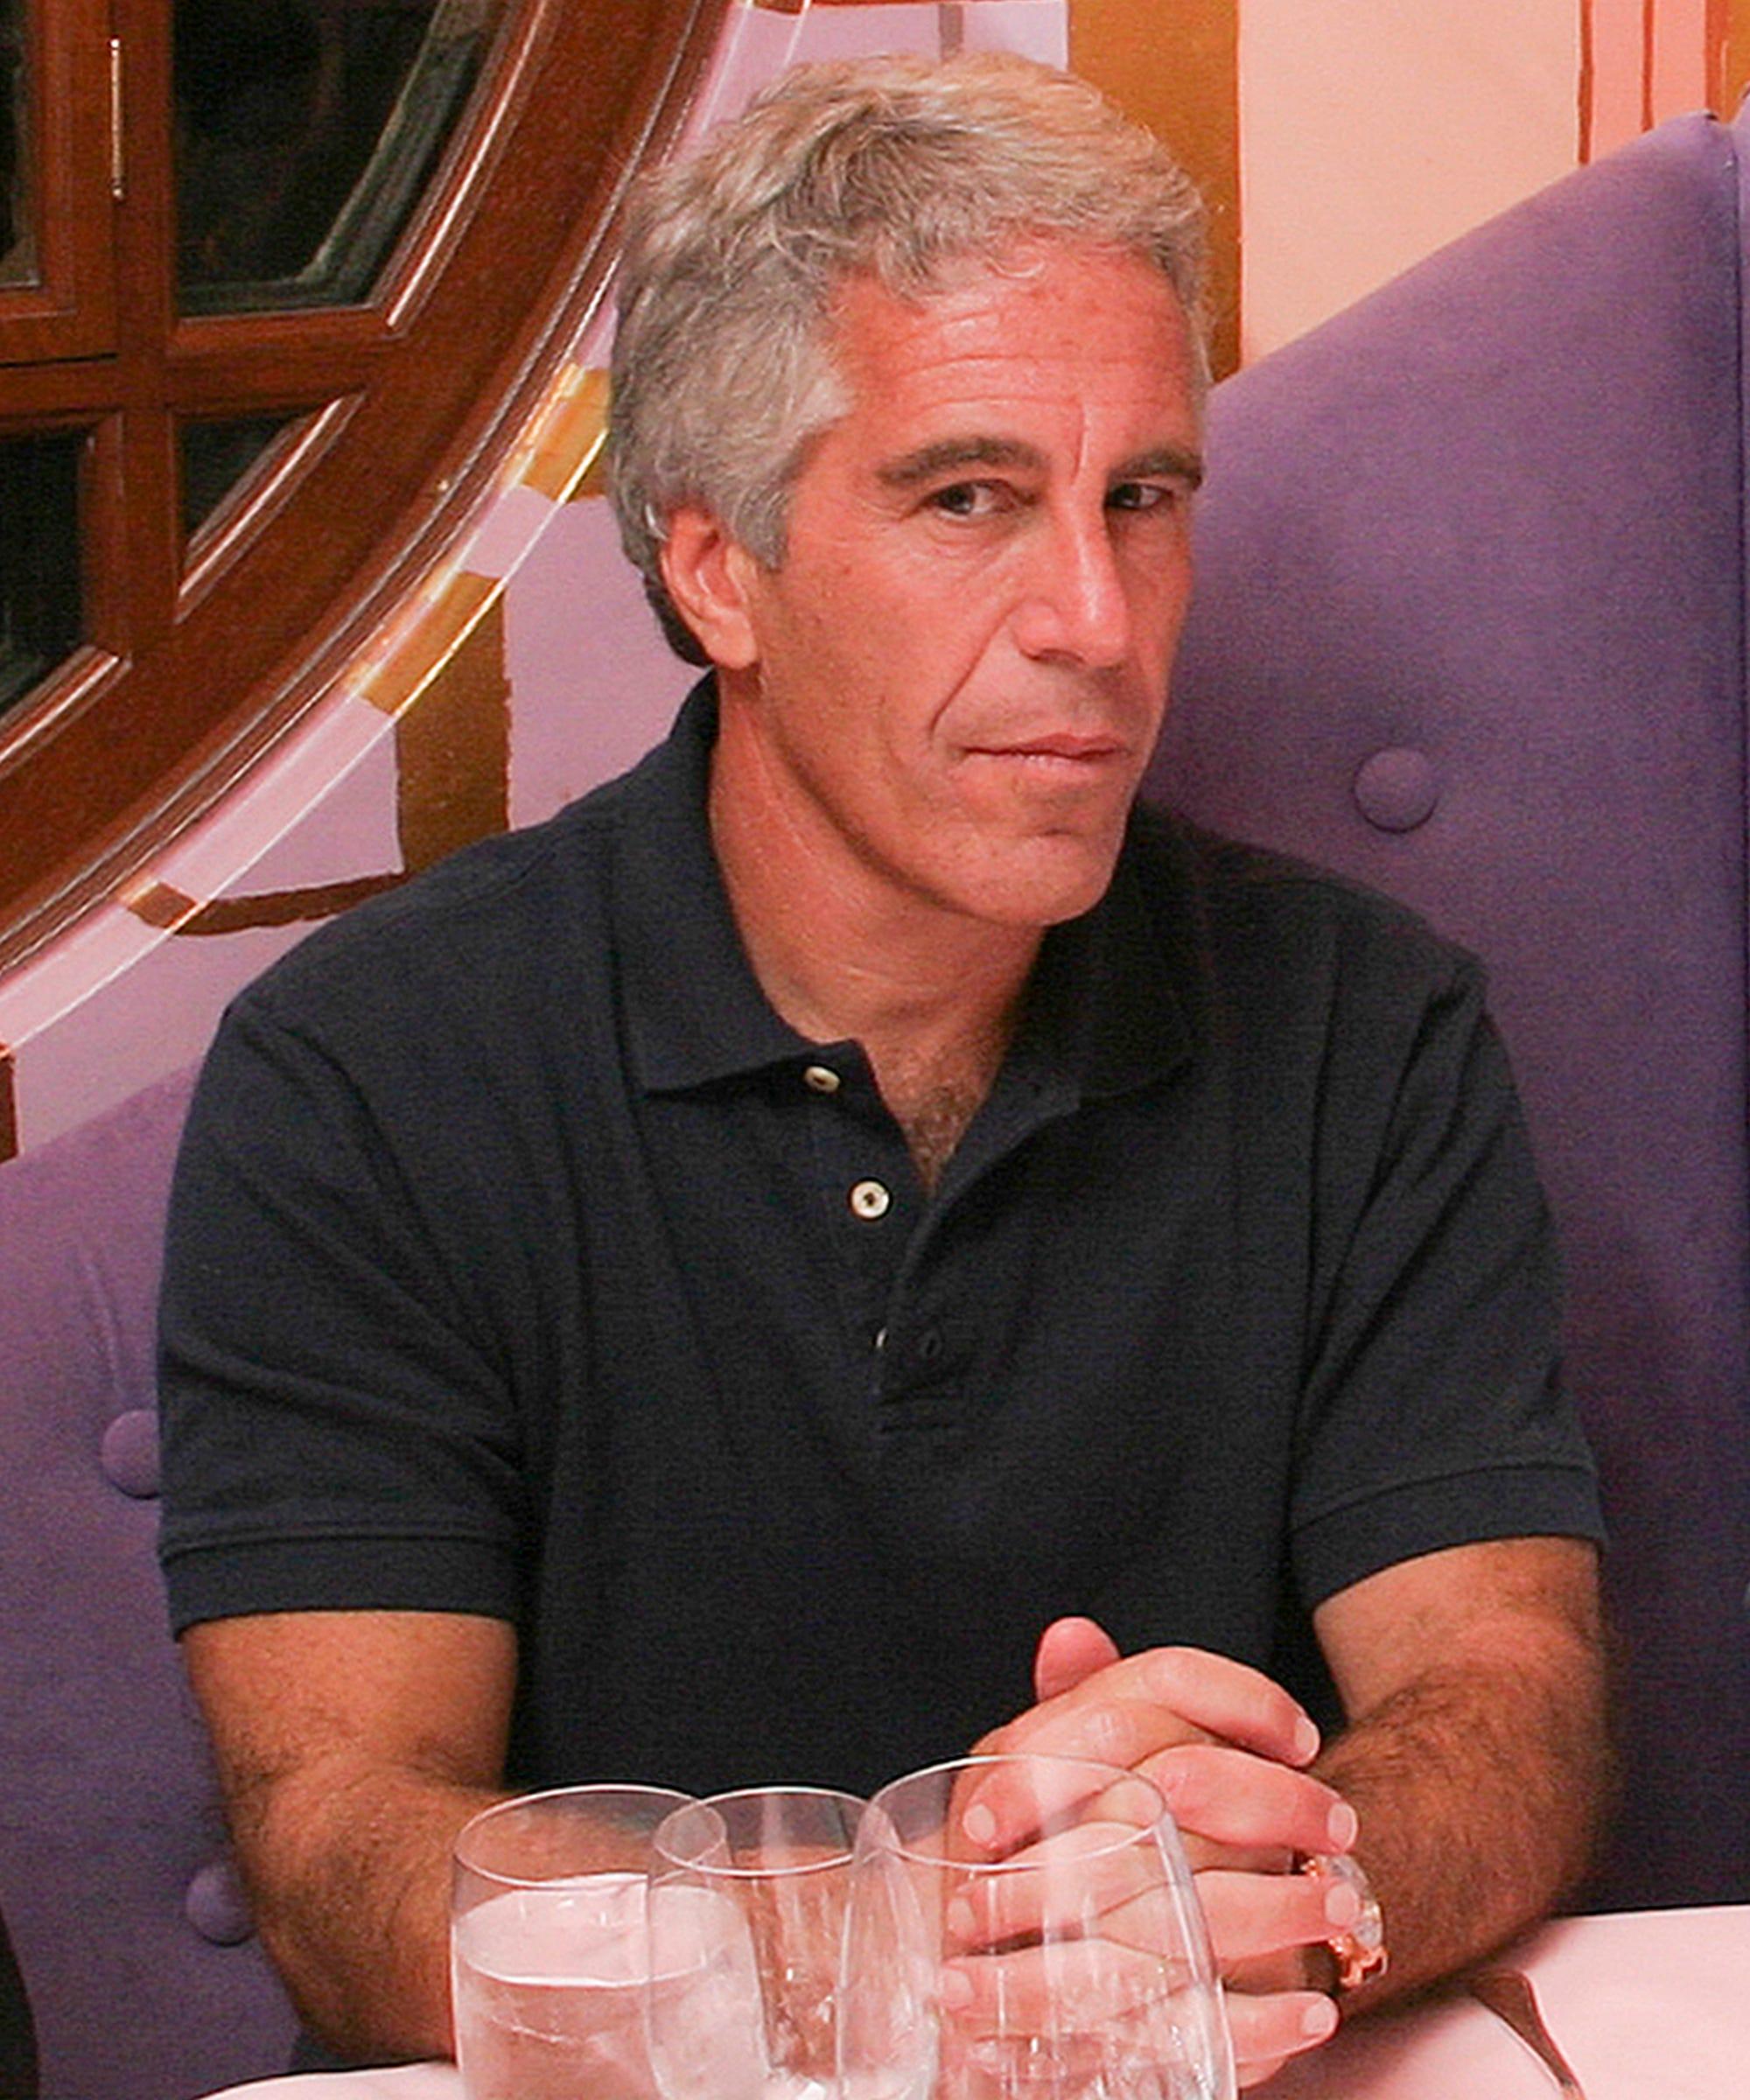 Jeffrey Epstein Documentary Halted Because His Life Was Too Disturbing